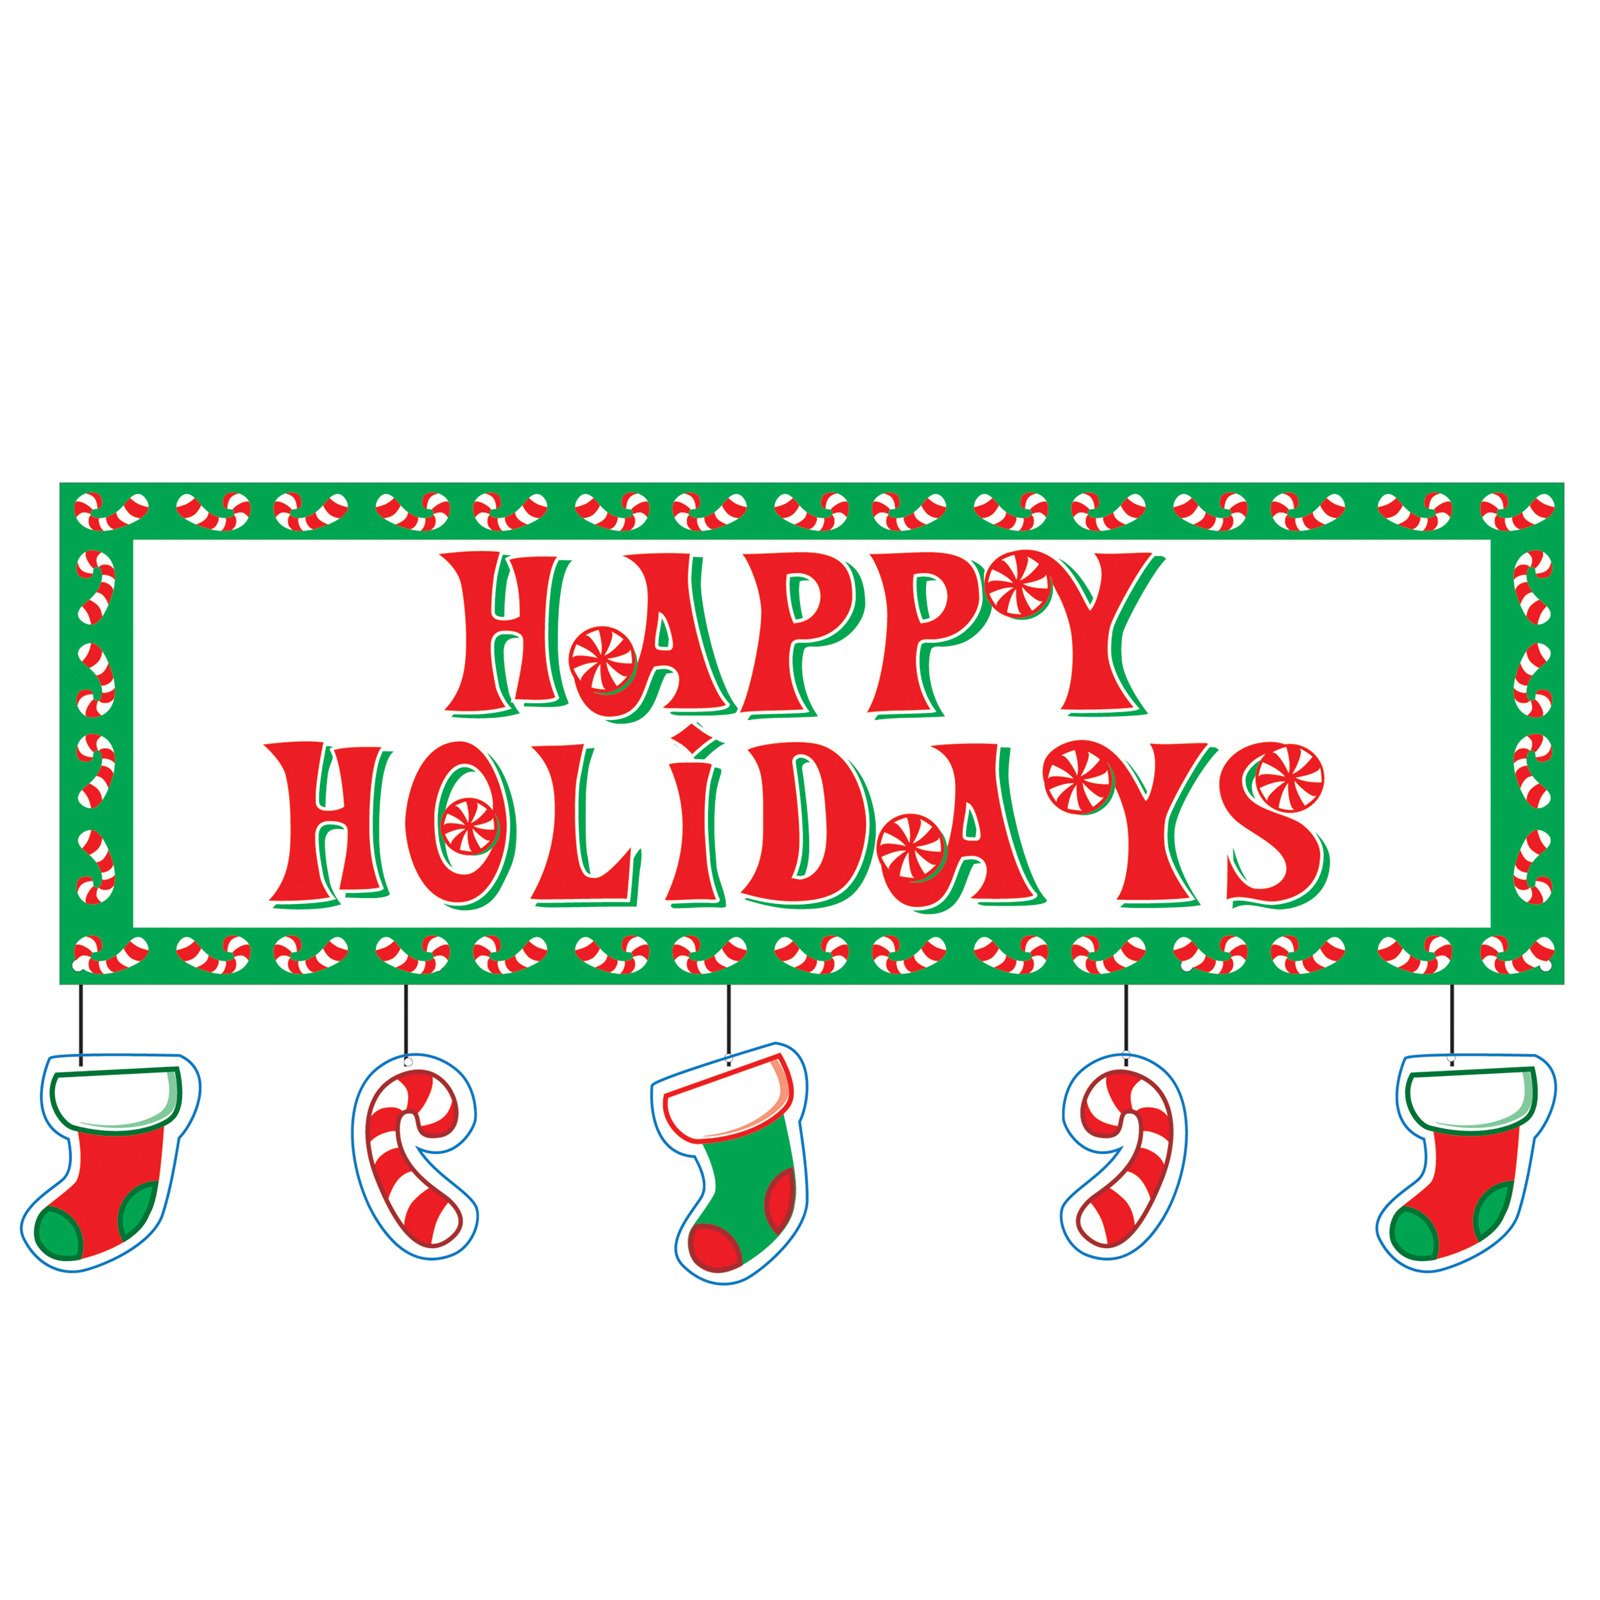 Happy Holidays Http Www Imgion Com Image-Happy Holidays Http Www Imgion Com Images 01 Winter Happy-5